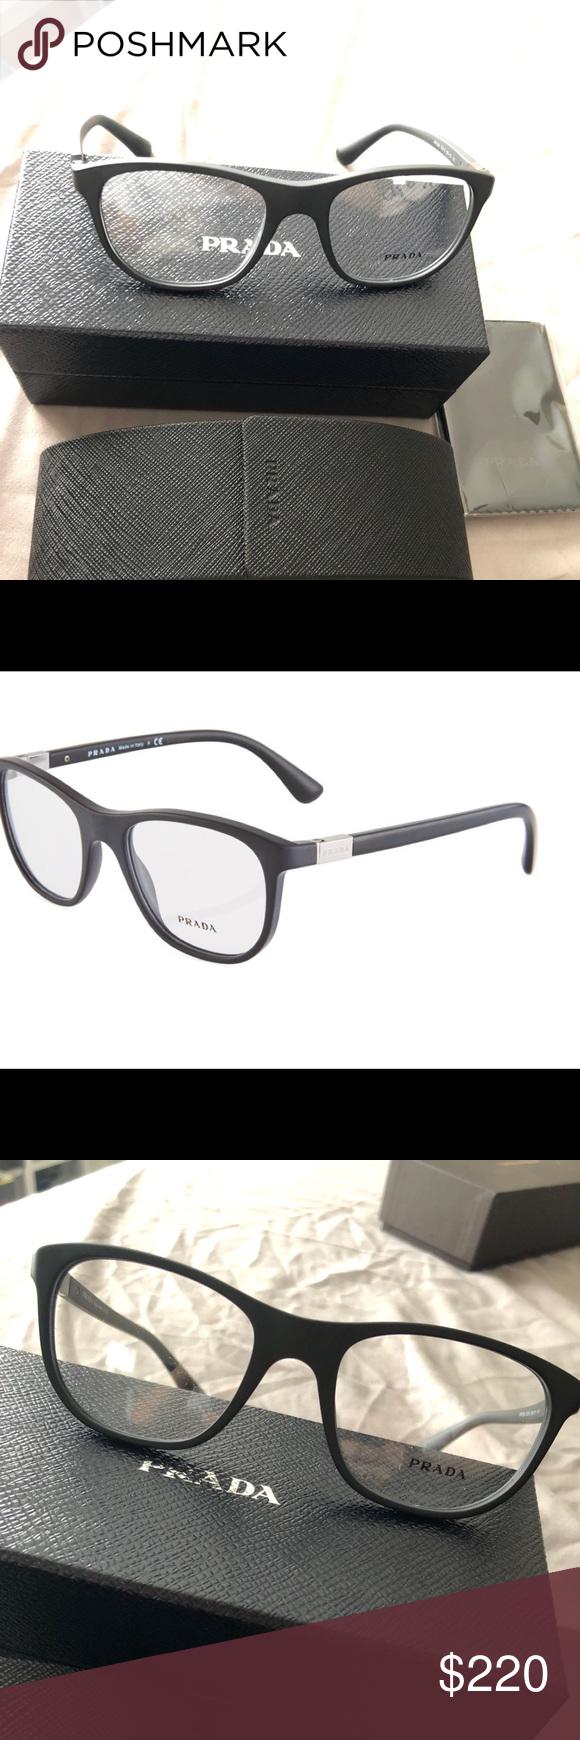 5363bf2b49fc Prada optical Frame Glasses Brand new with full box Prada Accessories  Glasses